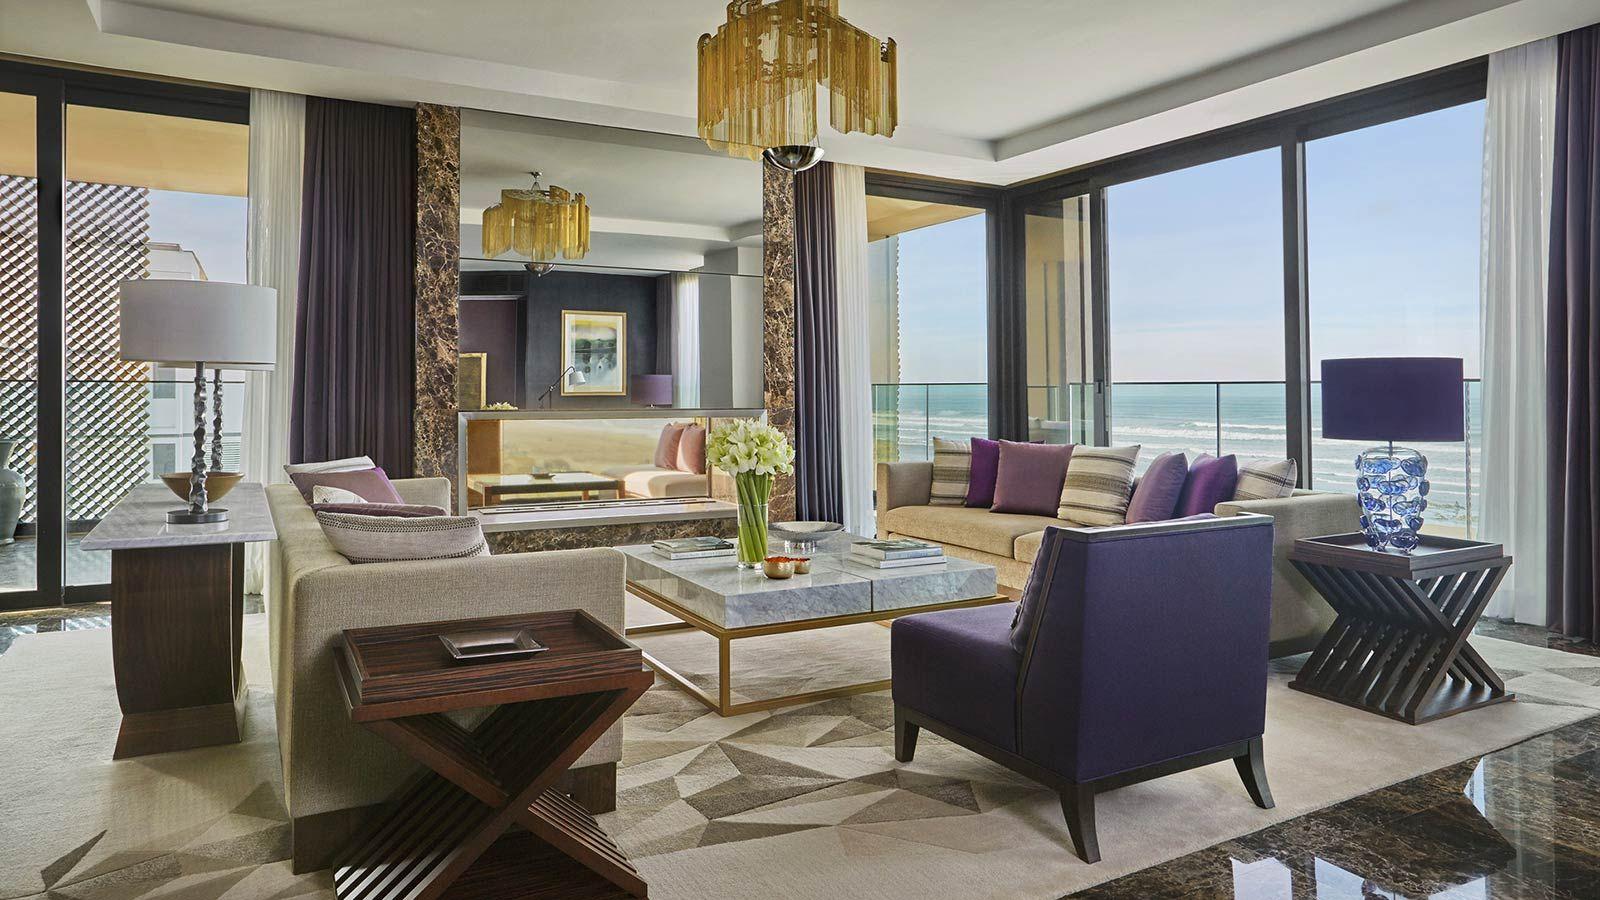 Casablanca Four Seasons Hotel, Luxury Sea View Room - Mace Group